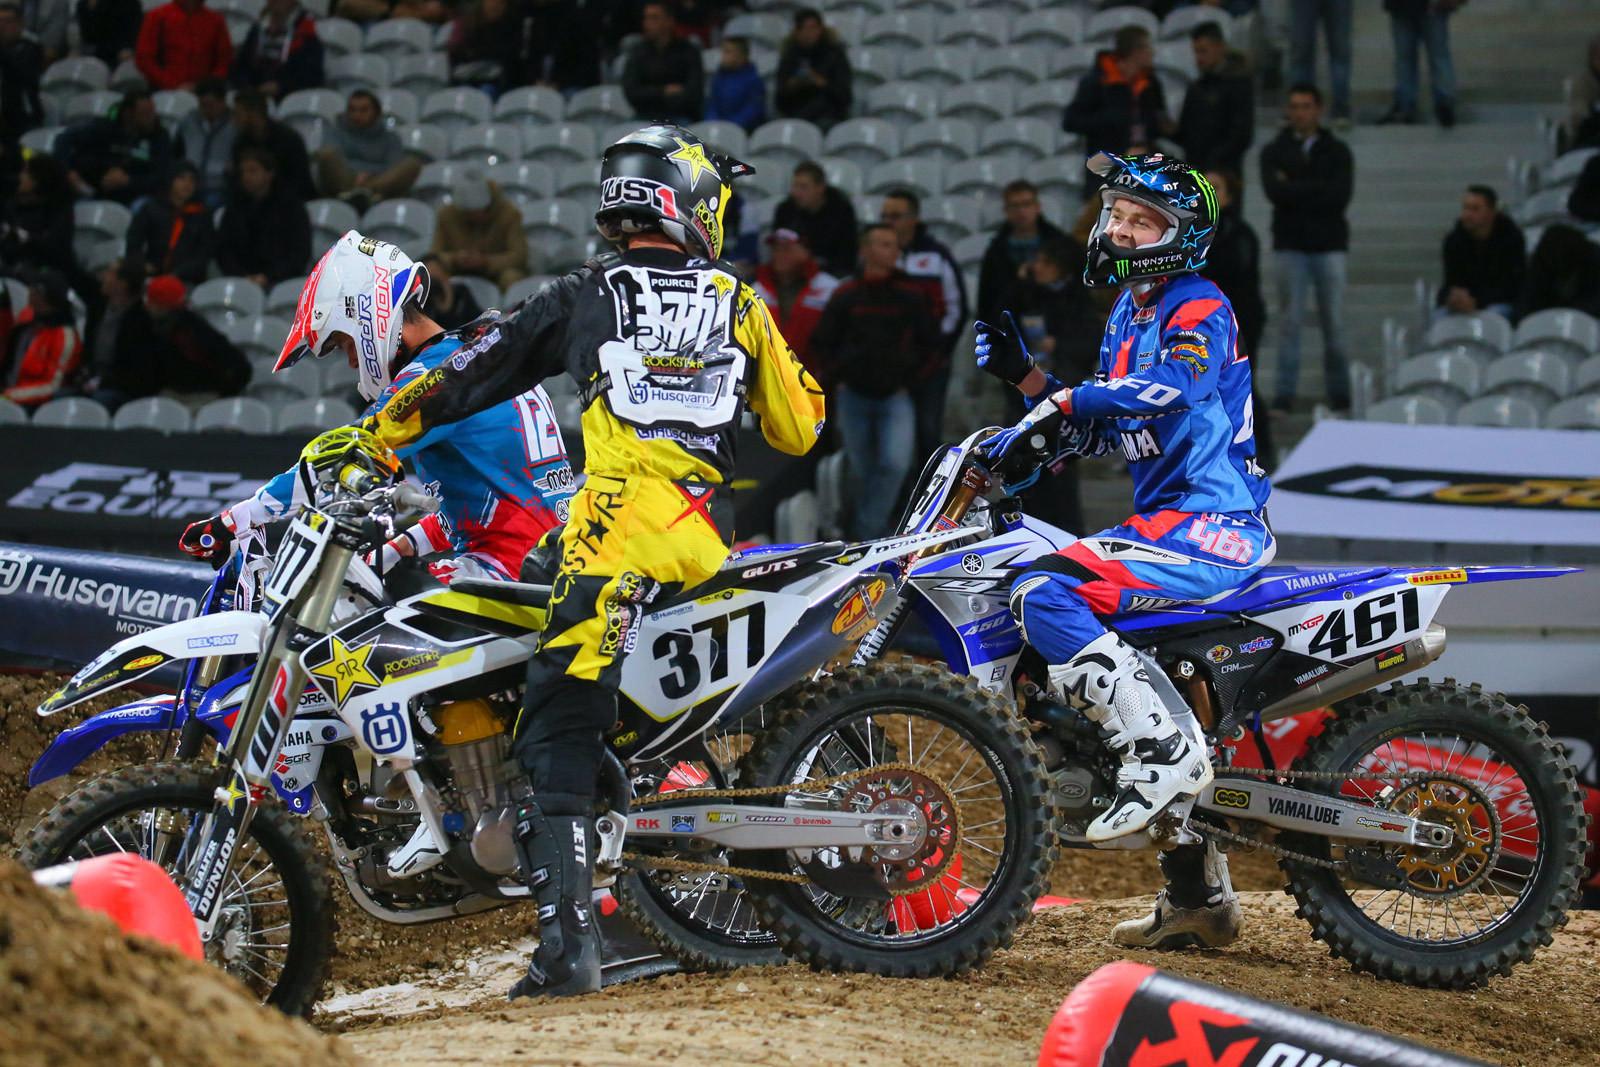 Christophe Pourcel and Romain Febvre - Vital MX Pit Bits: Paris-Lille Supercross - Motocross Pictures - Vital MX